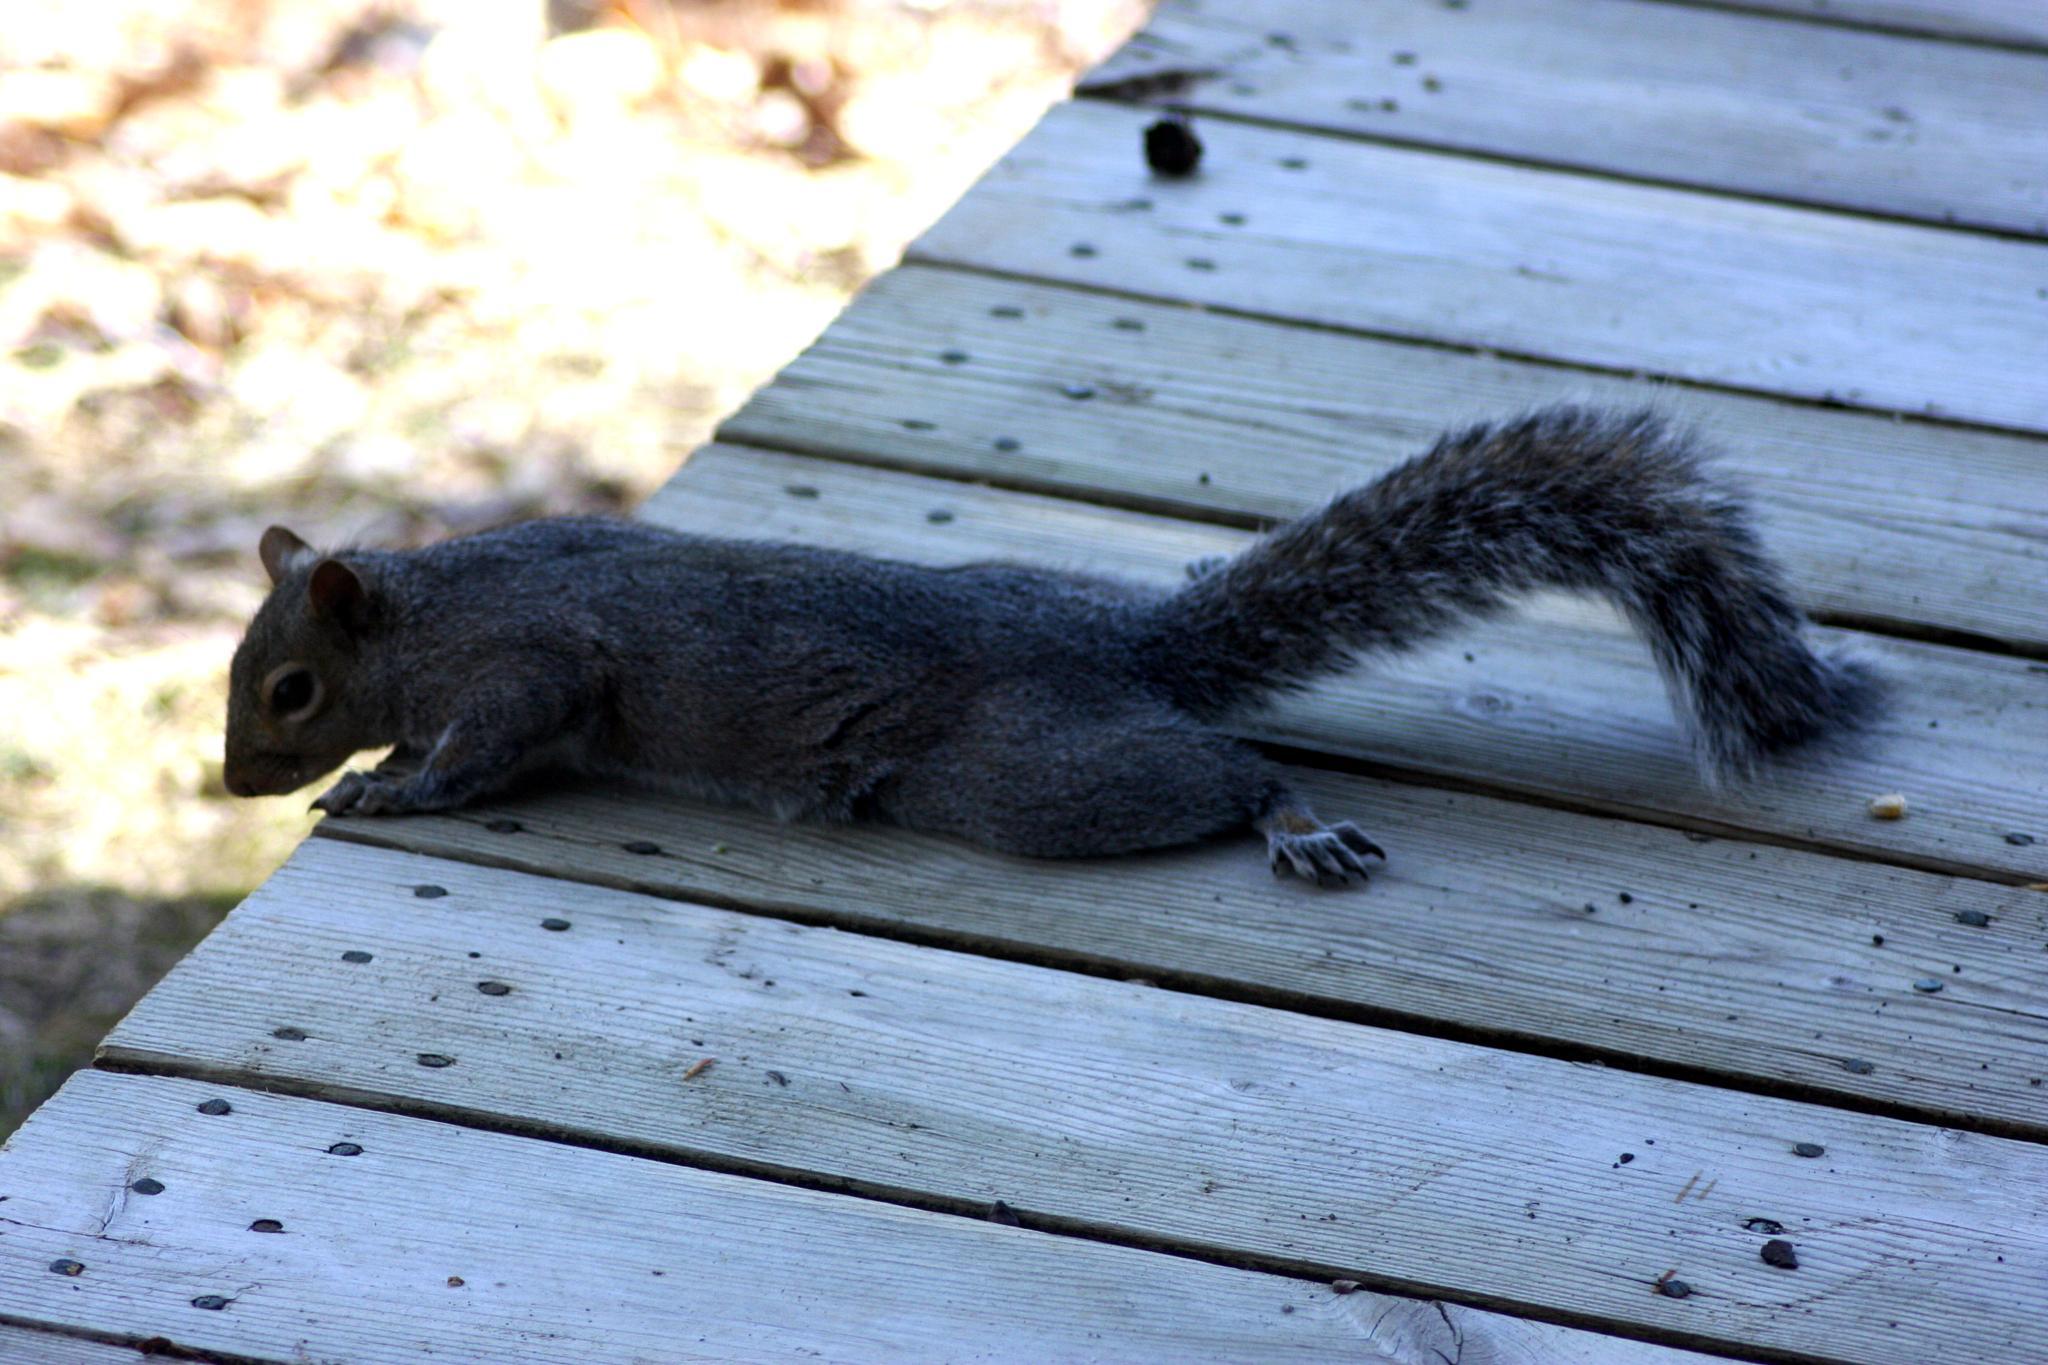 Curious squirrel by Jaroslav Reznicek